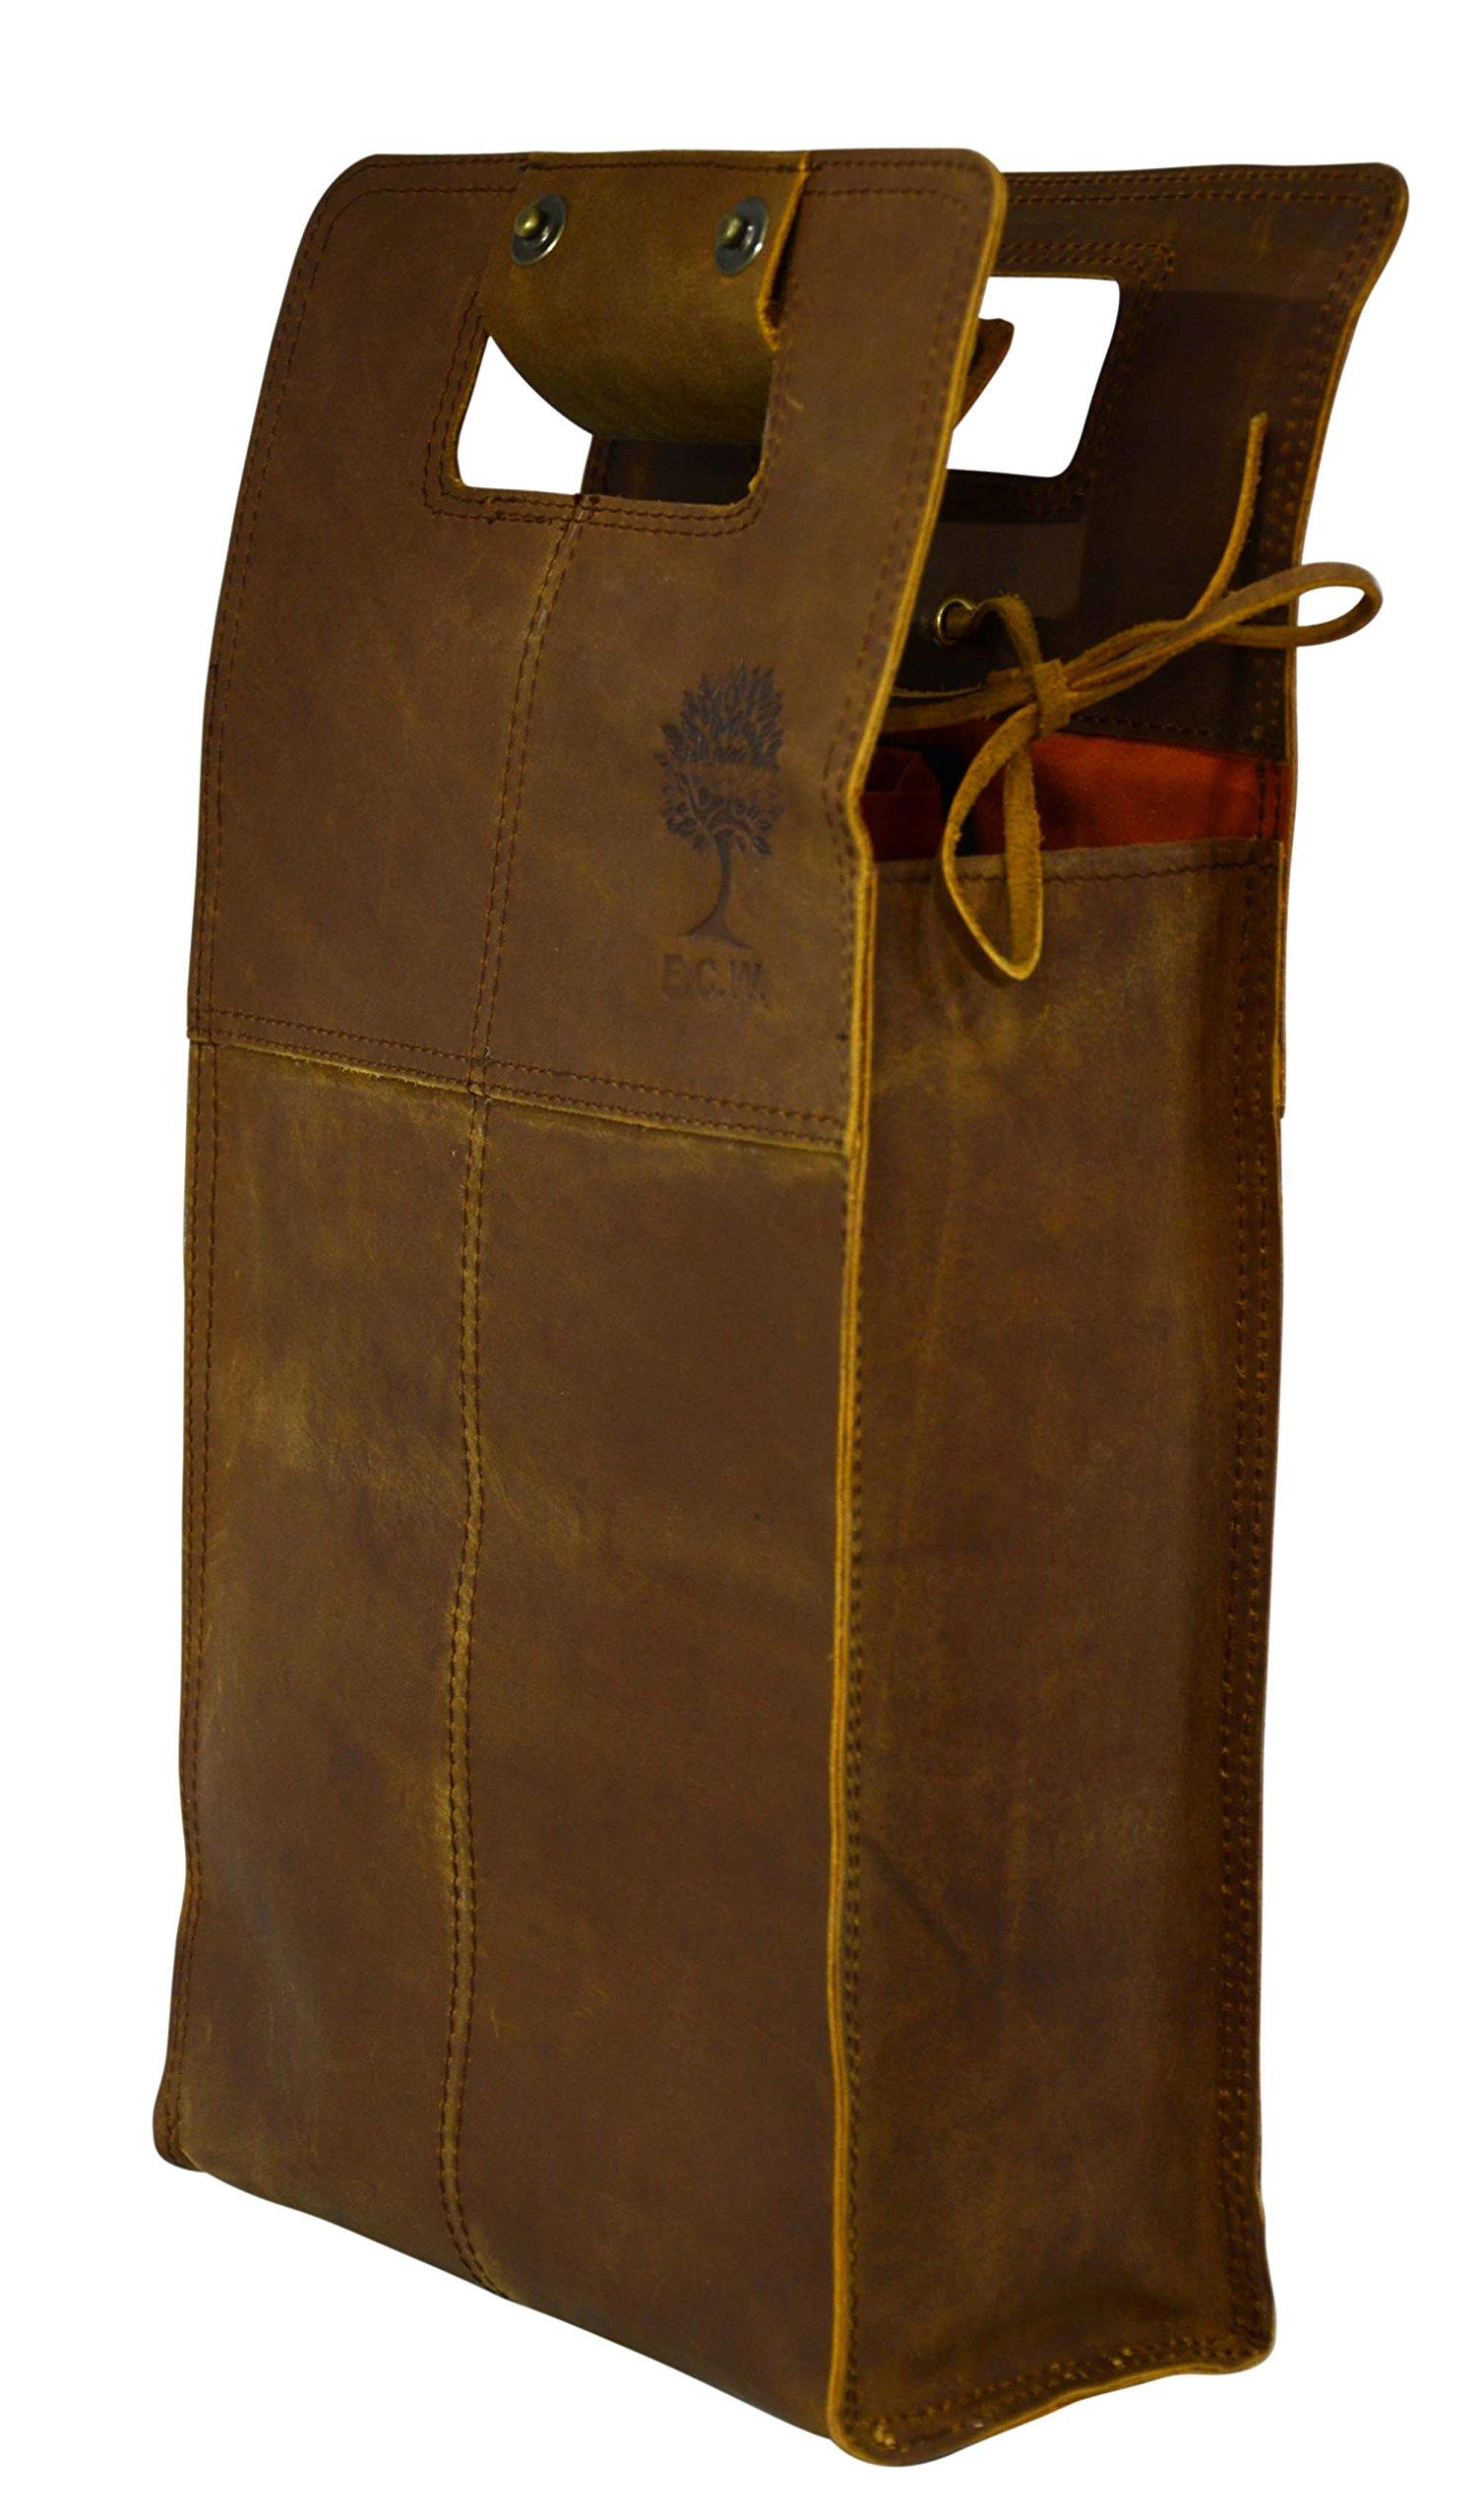 Double Wine Bottle Carrier Bag Leather Bottle Holder Tote Reusable Gift Bag Champagne Case, Valentines Gift Bag by ECOCRAFTWORLD (Image #3)